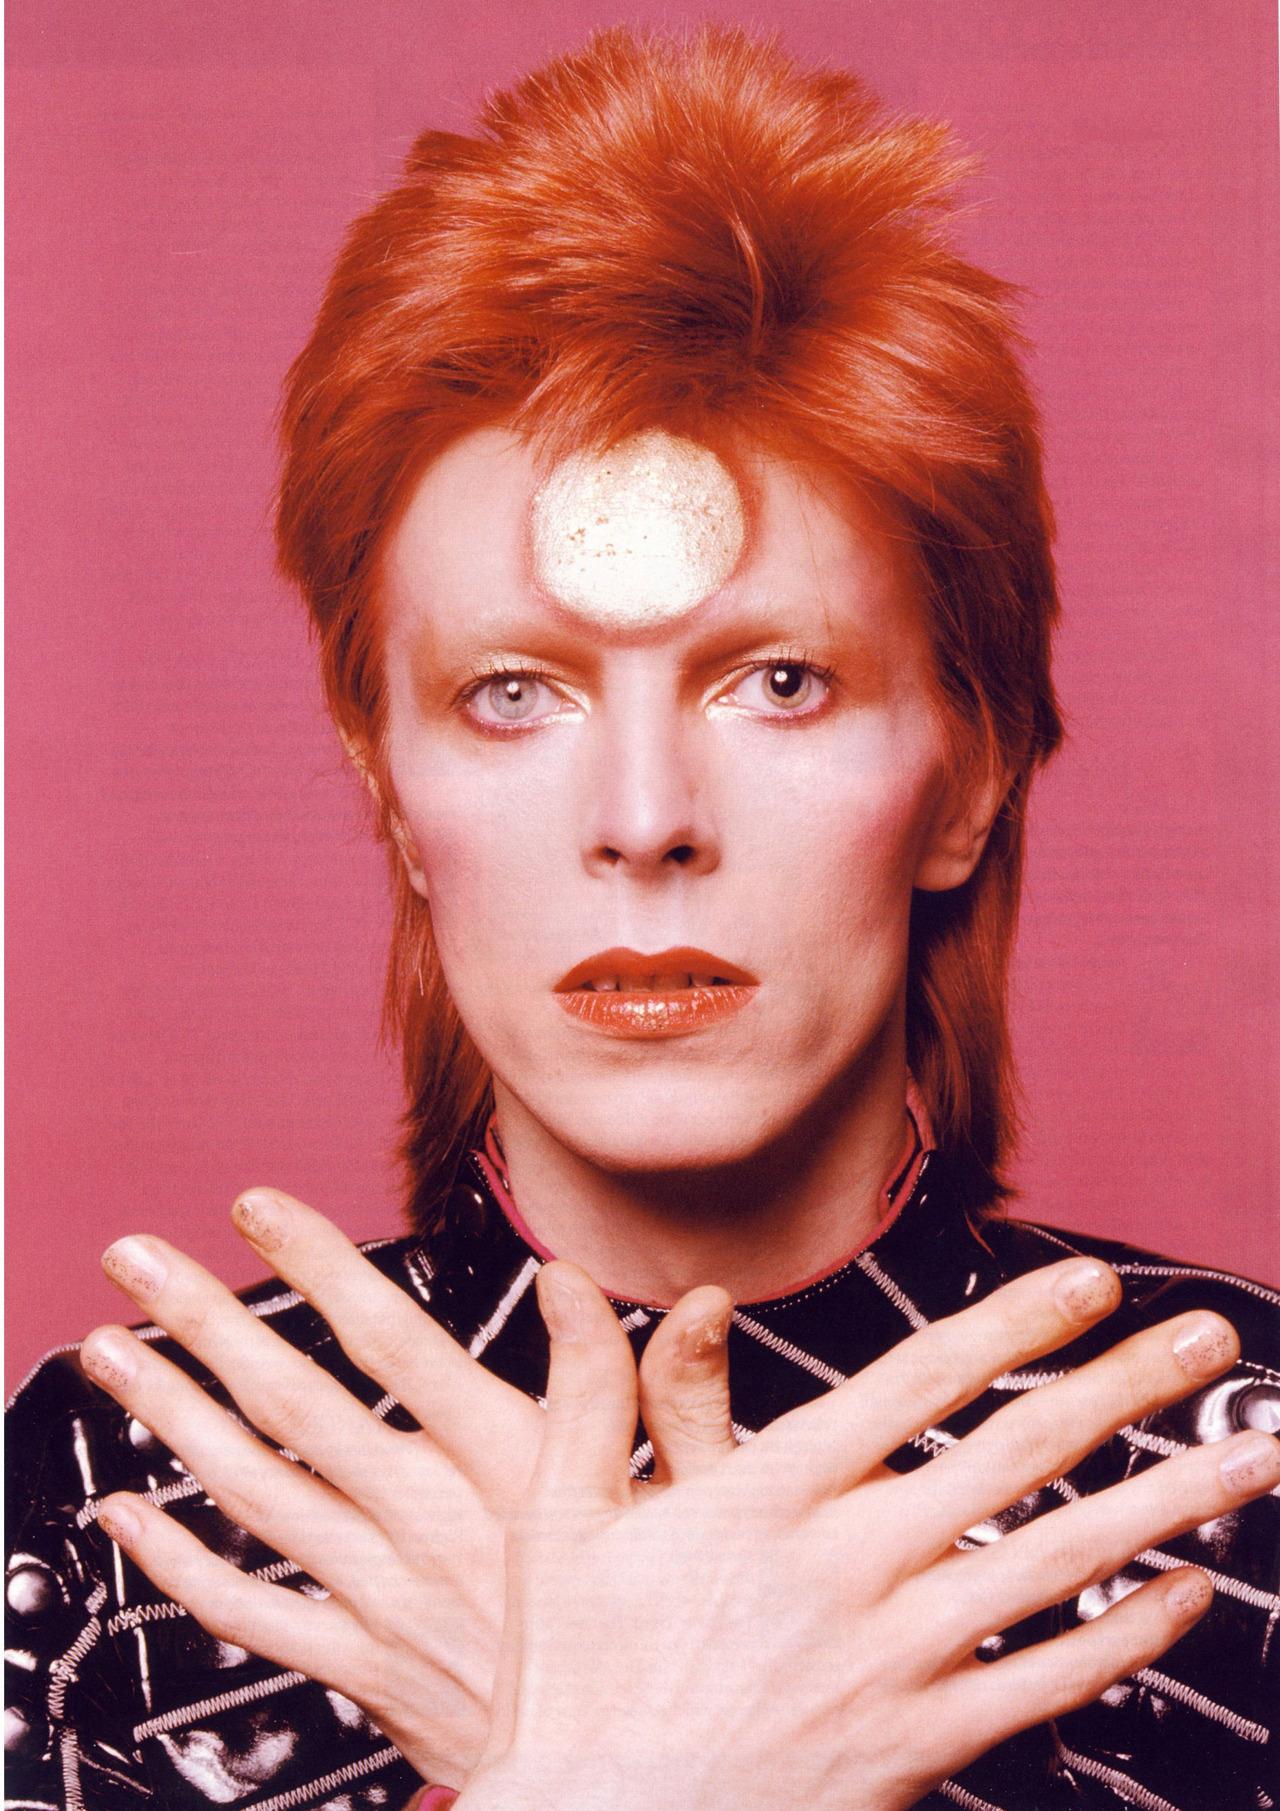 Part 3 : Ziggy Stardust